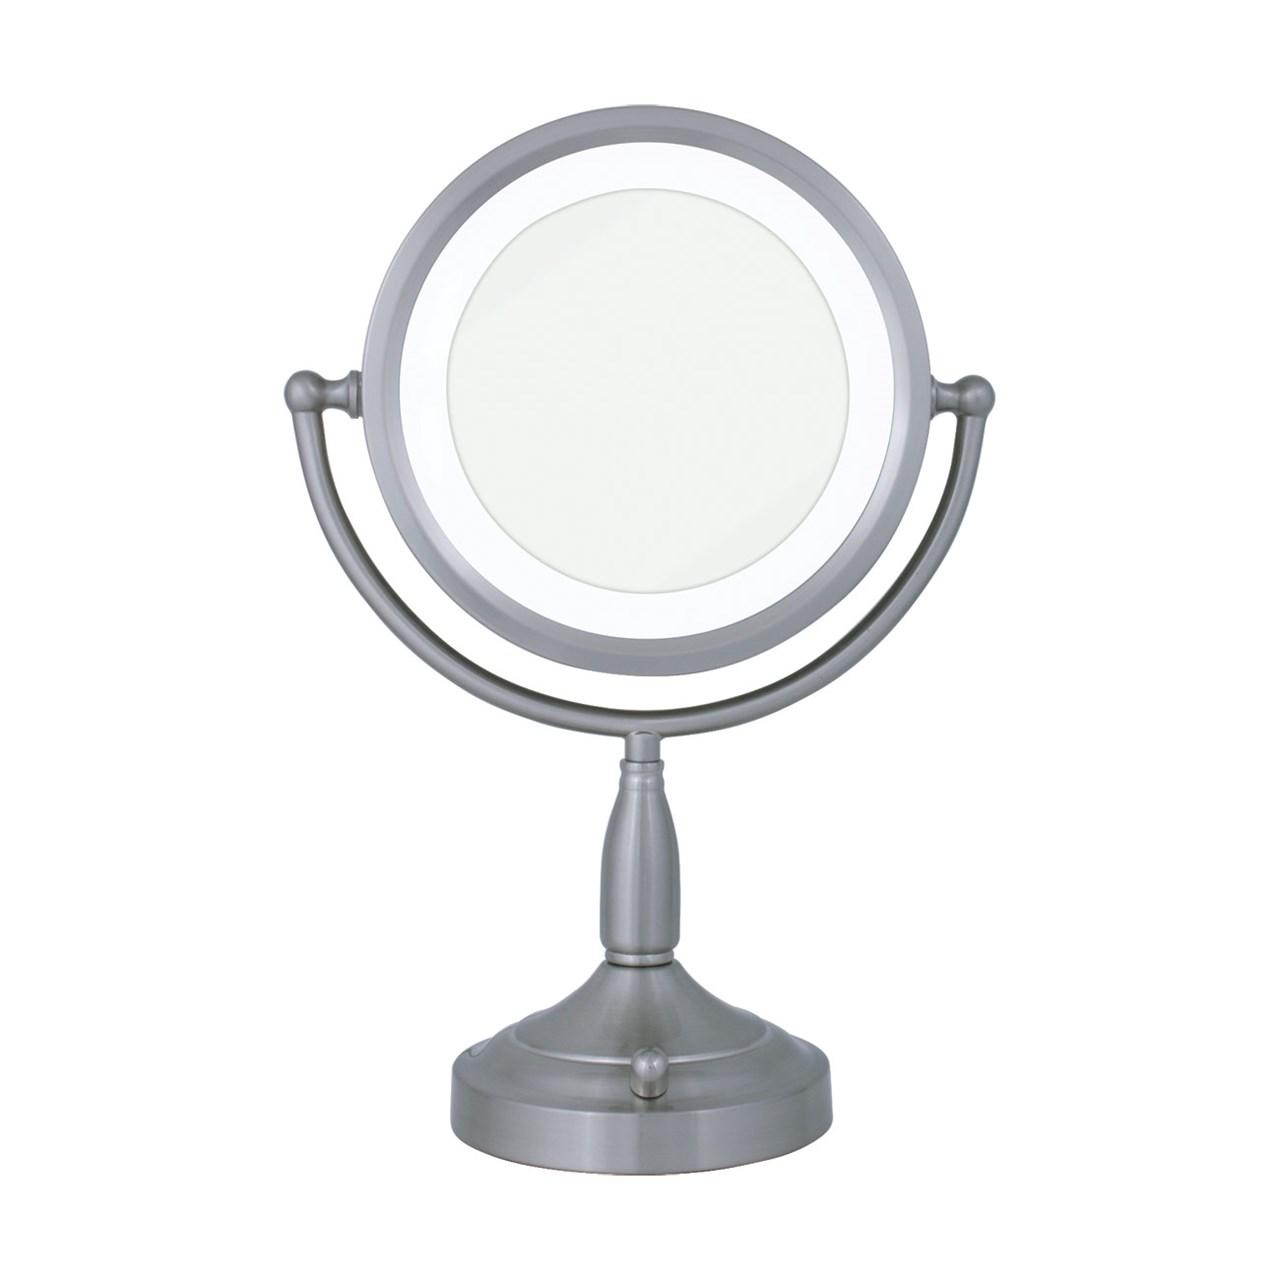 Maxiaids Lighted Round Vanity Mirror 8x 1x